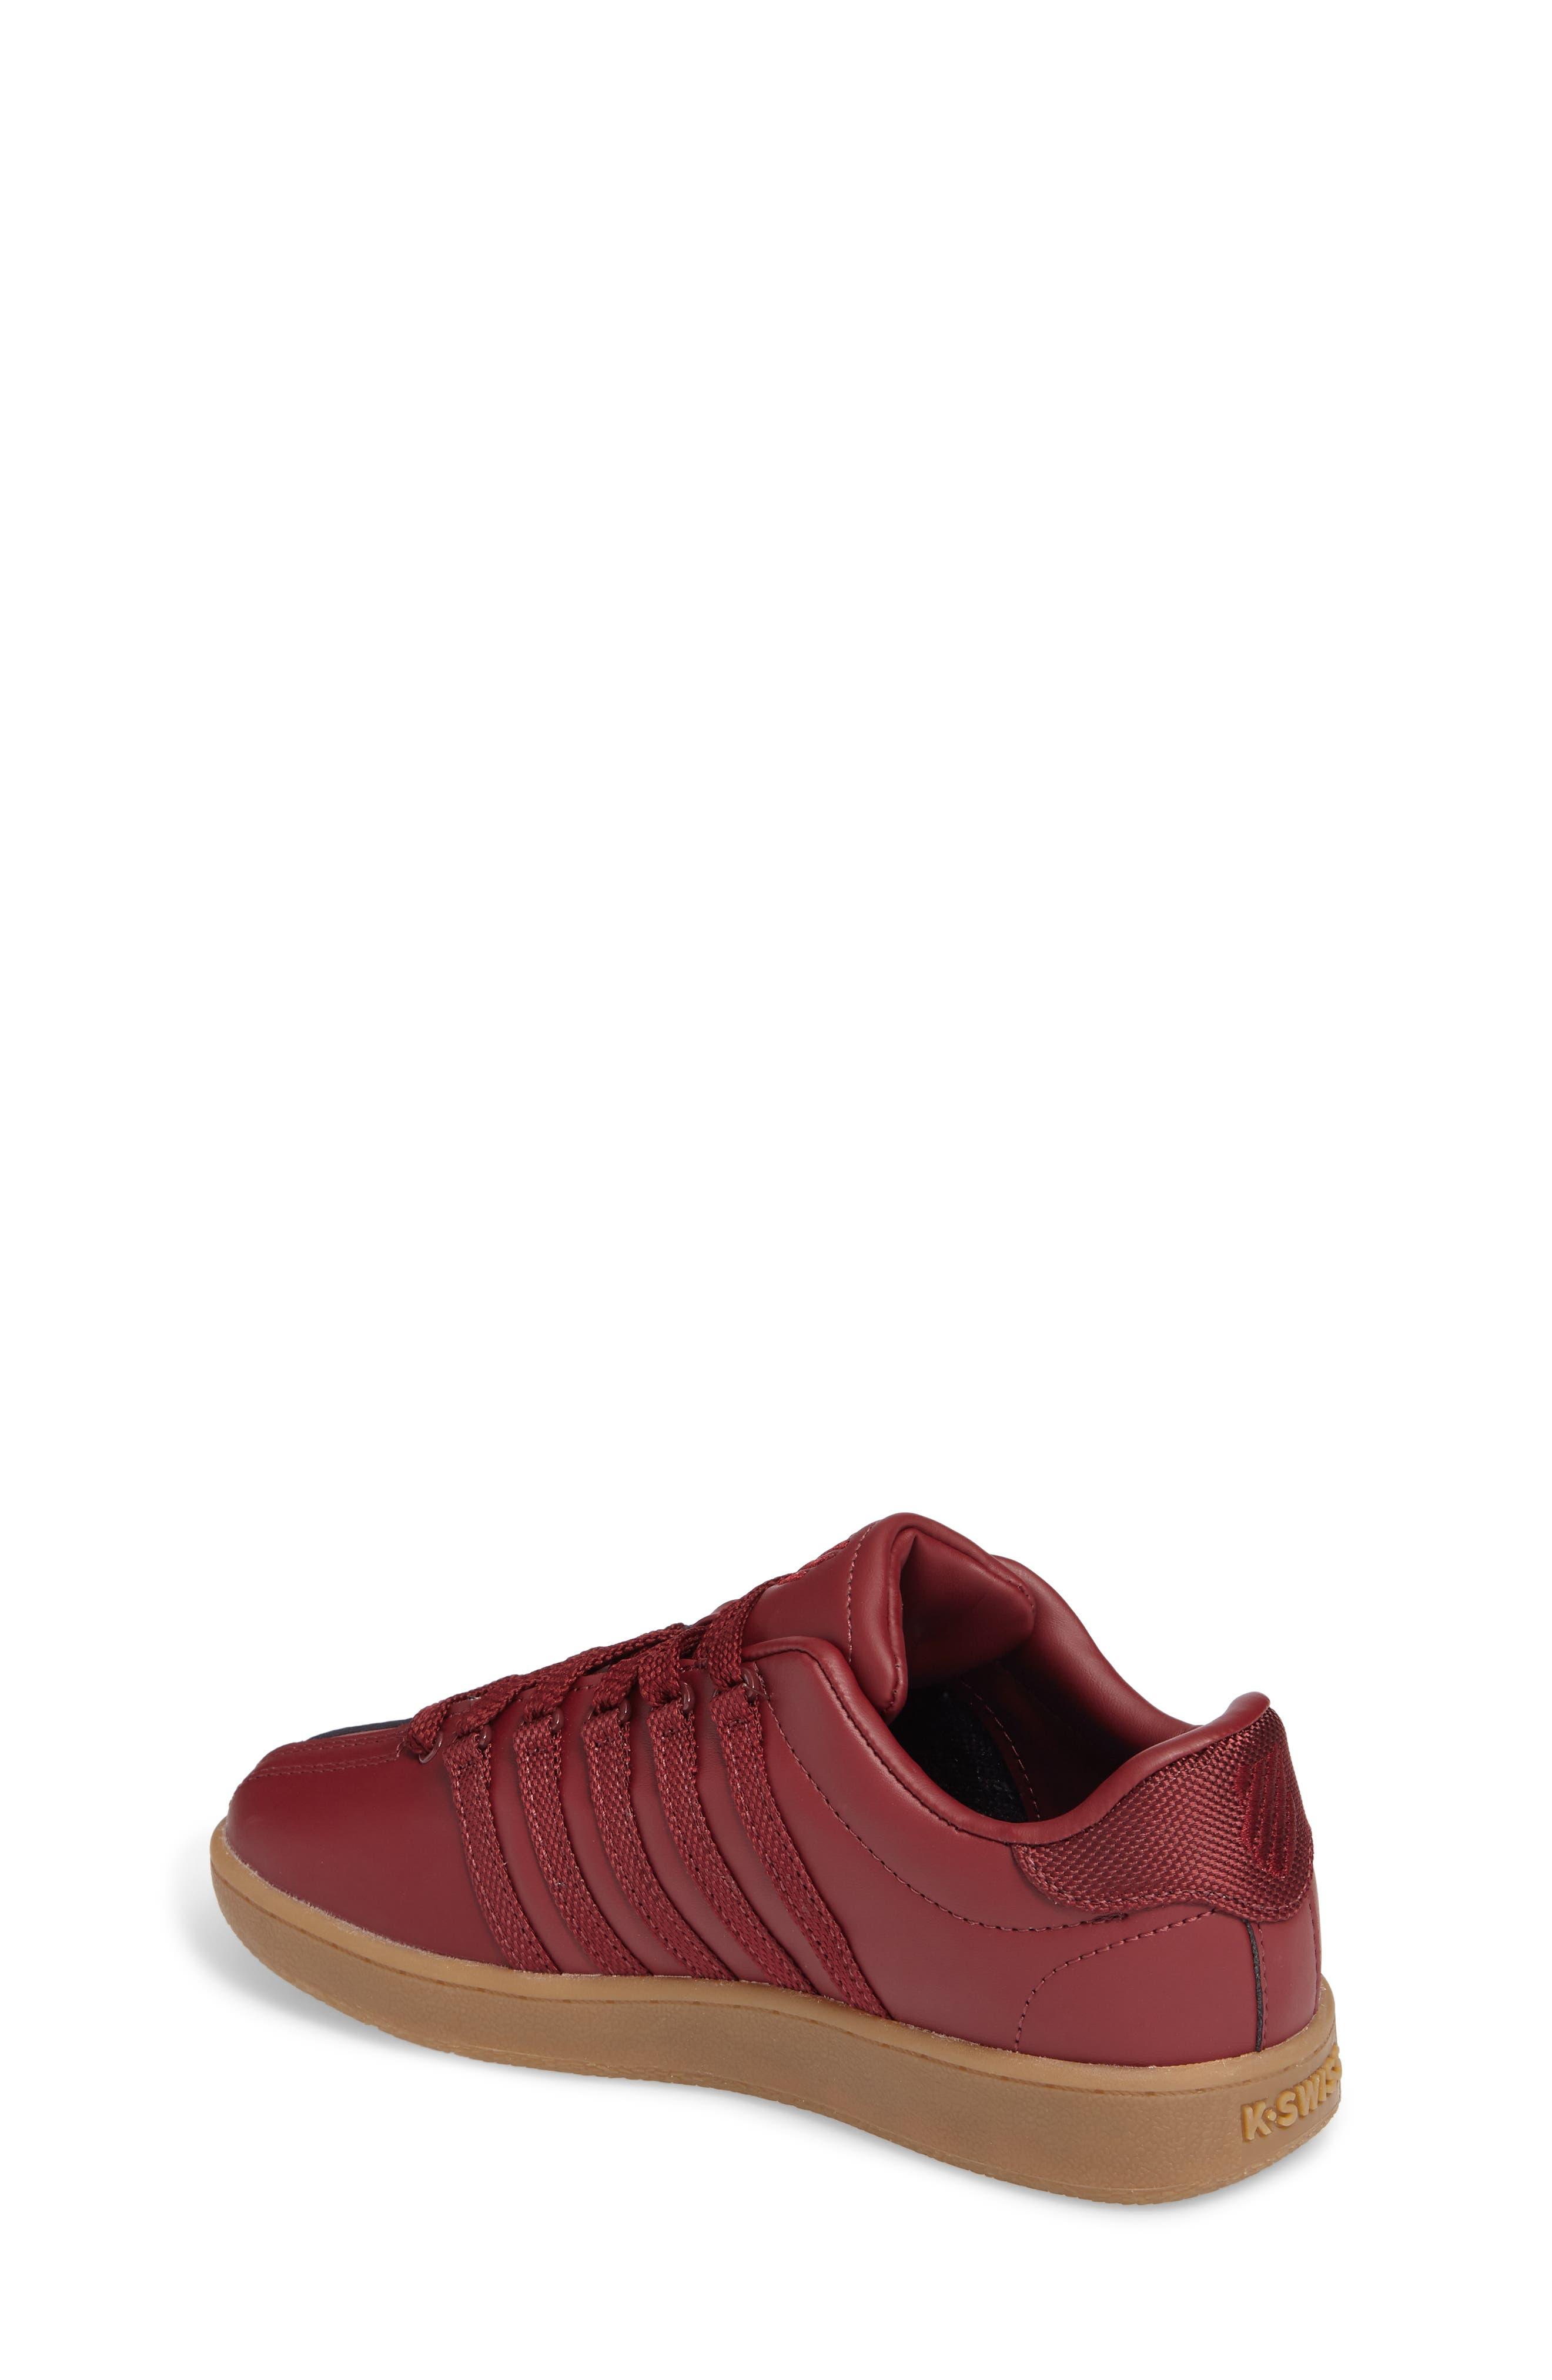 'Classic' Sneaker,                             Alternate thumbnail 16, color,